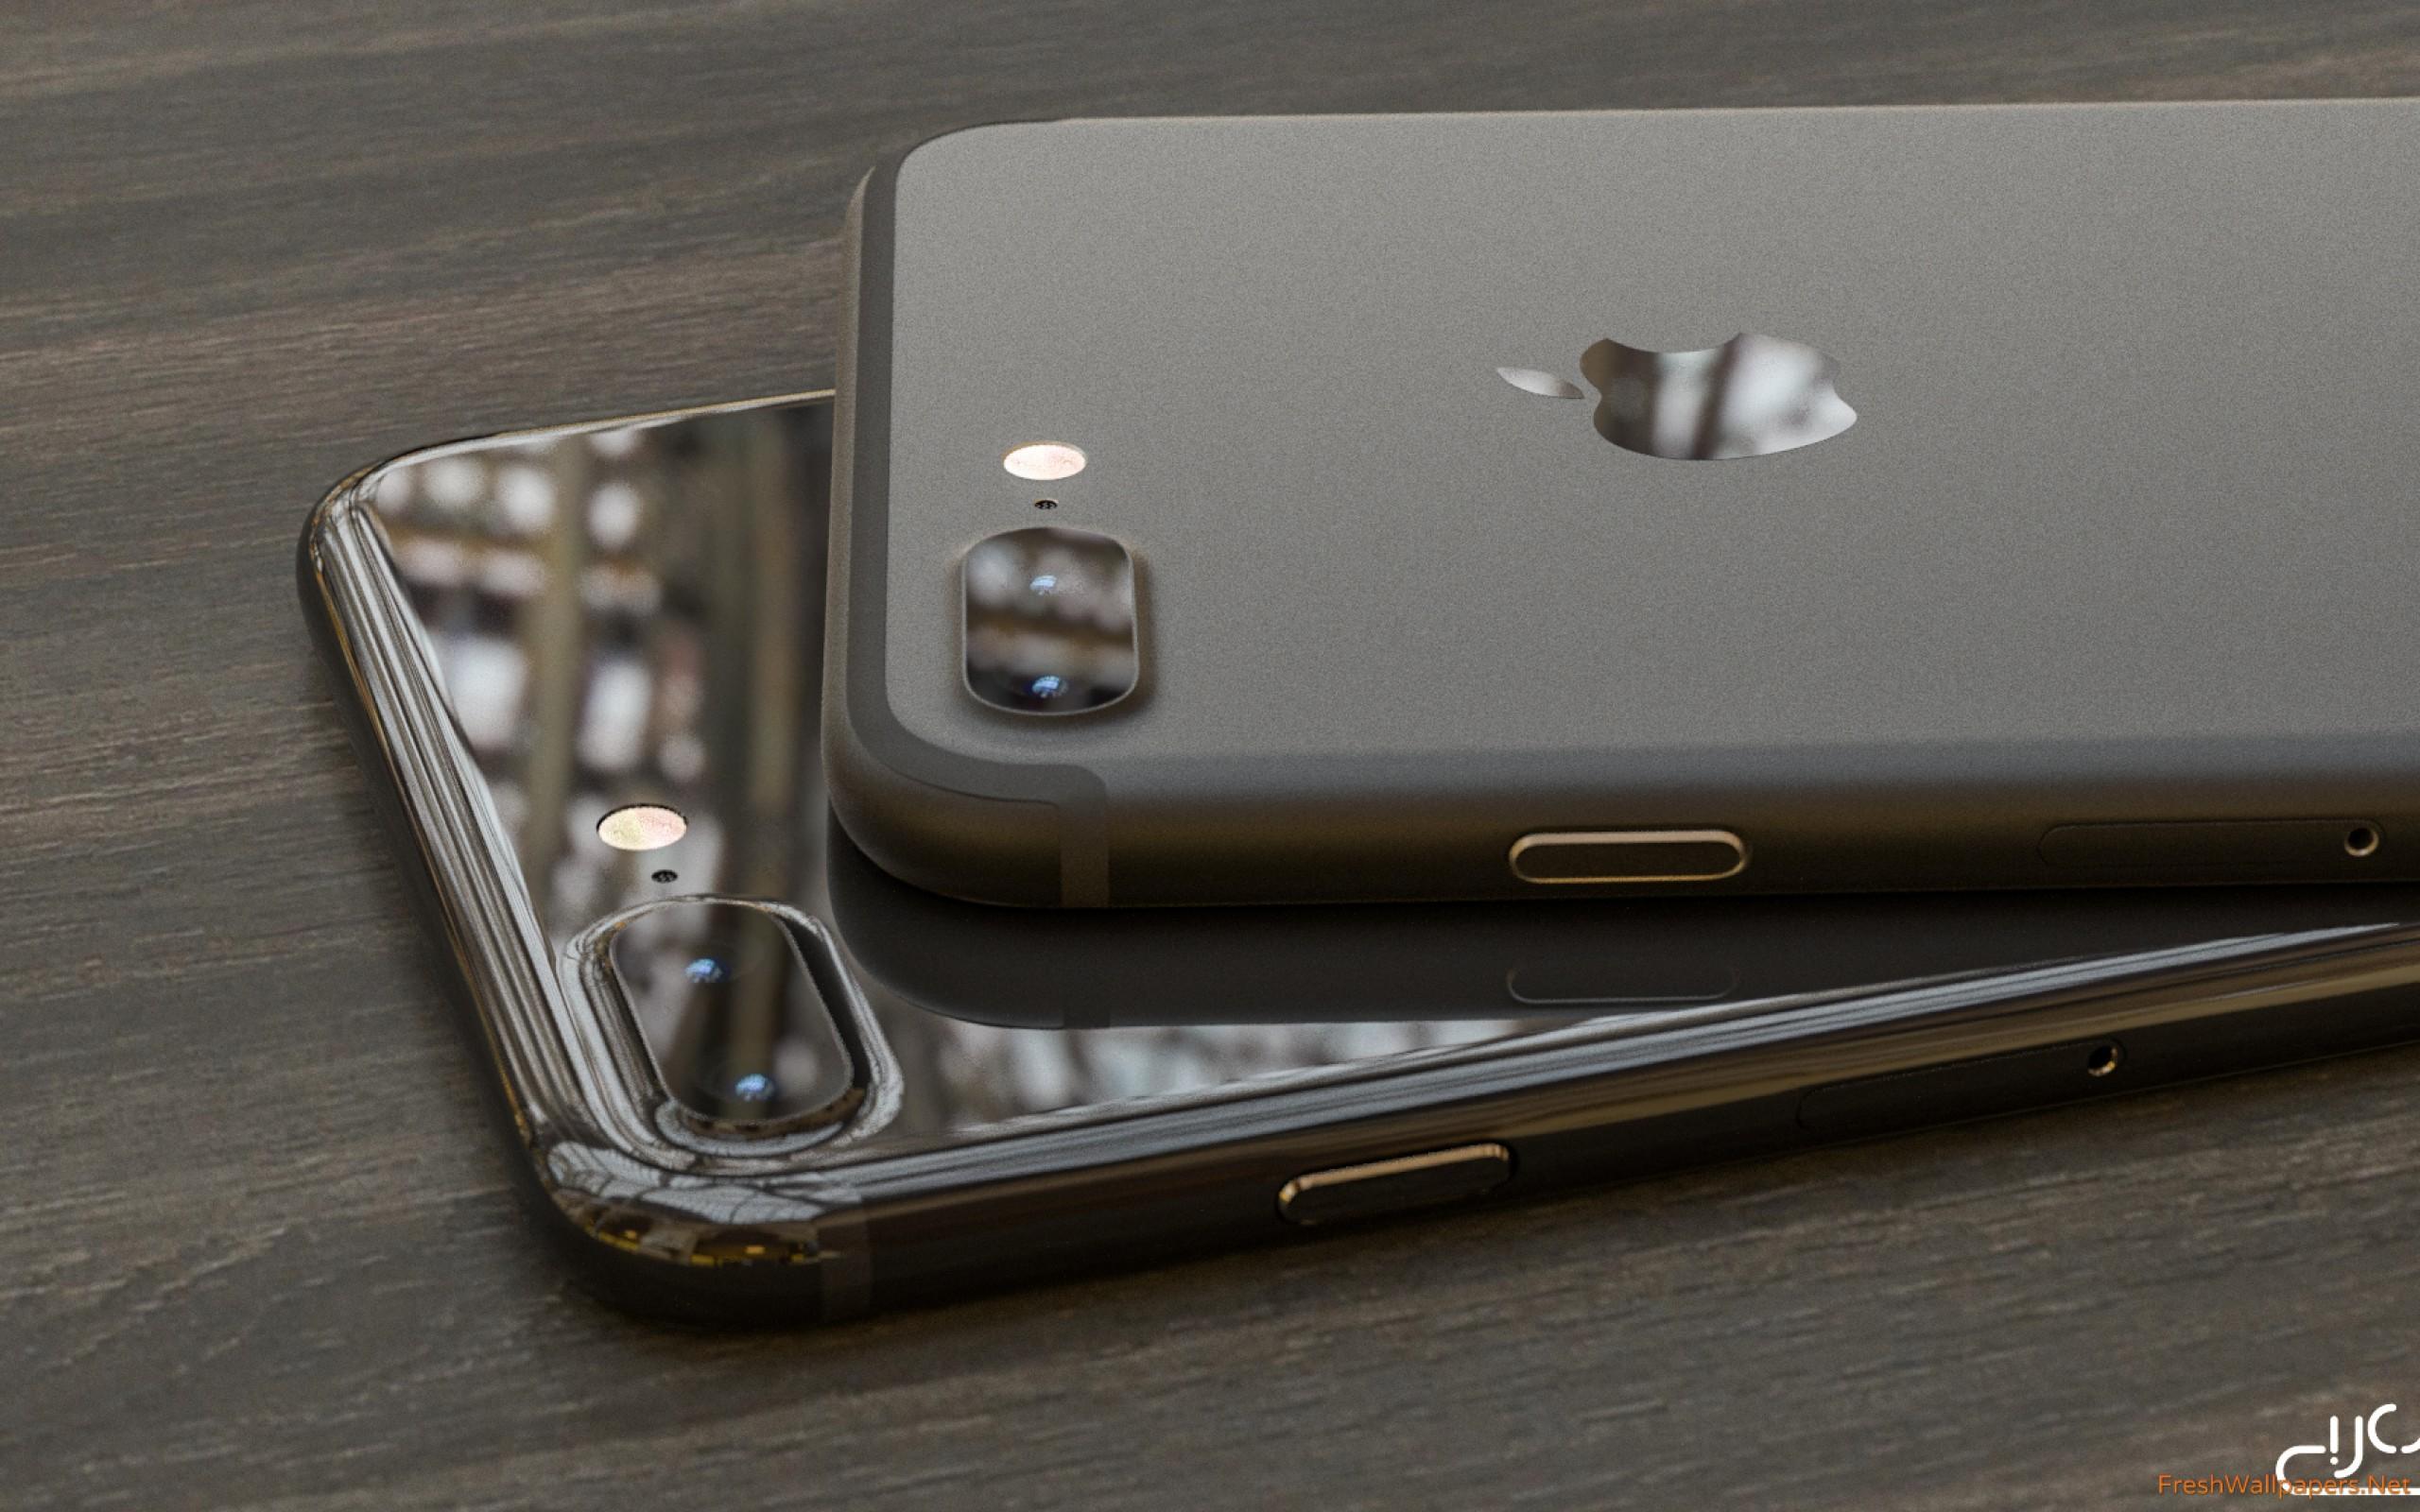 Iphone 7 Plus Mobile Hd - HD Wallpaper